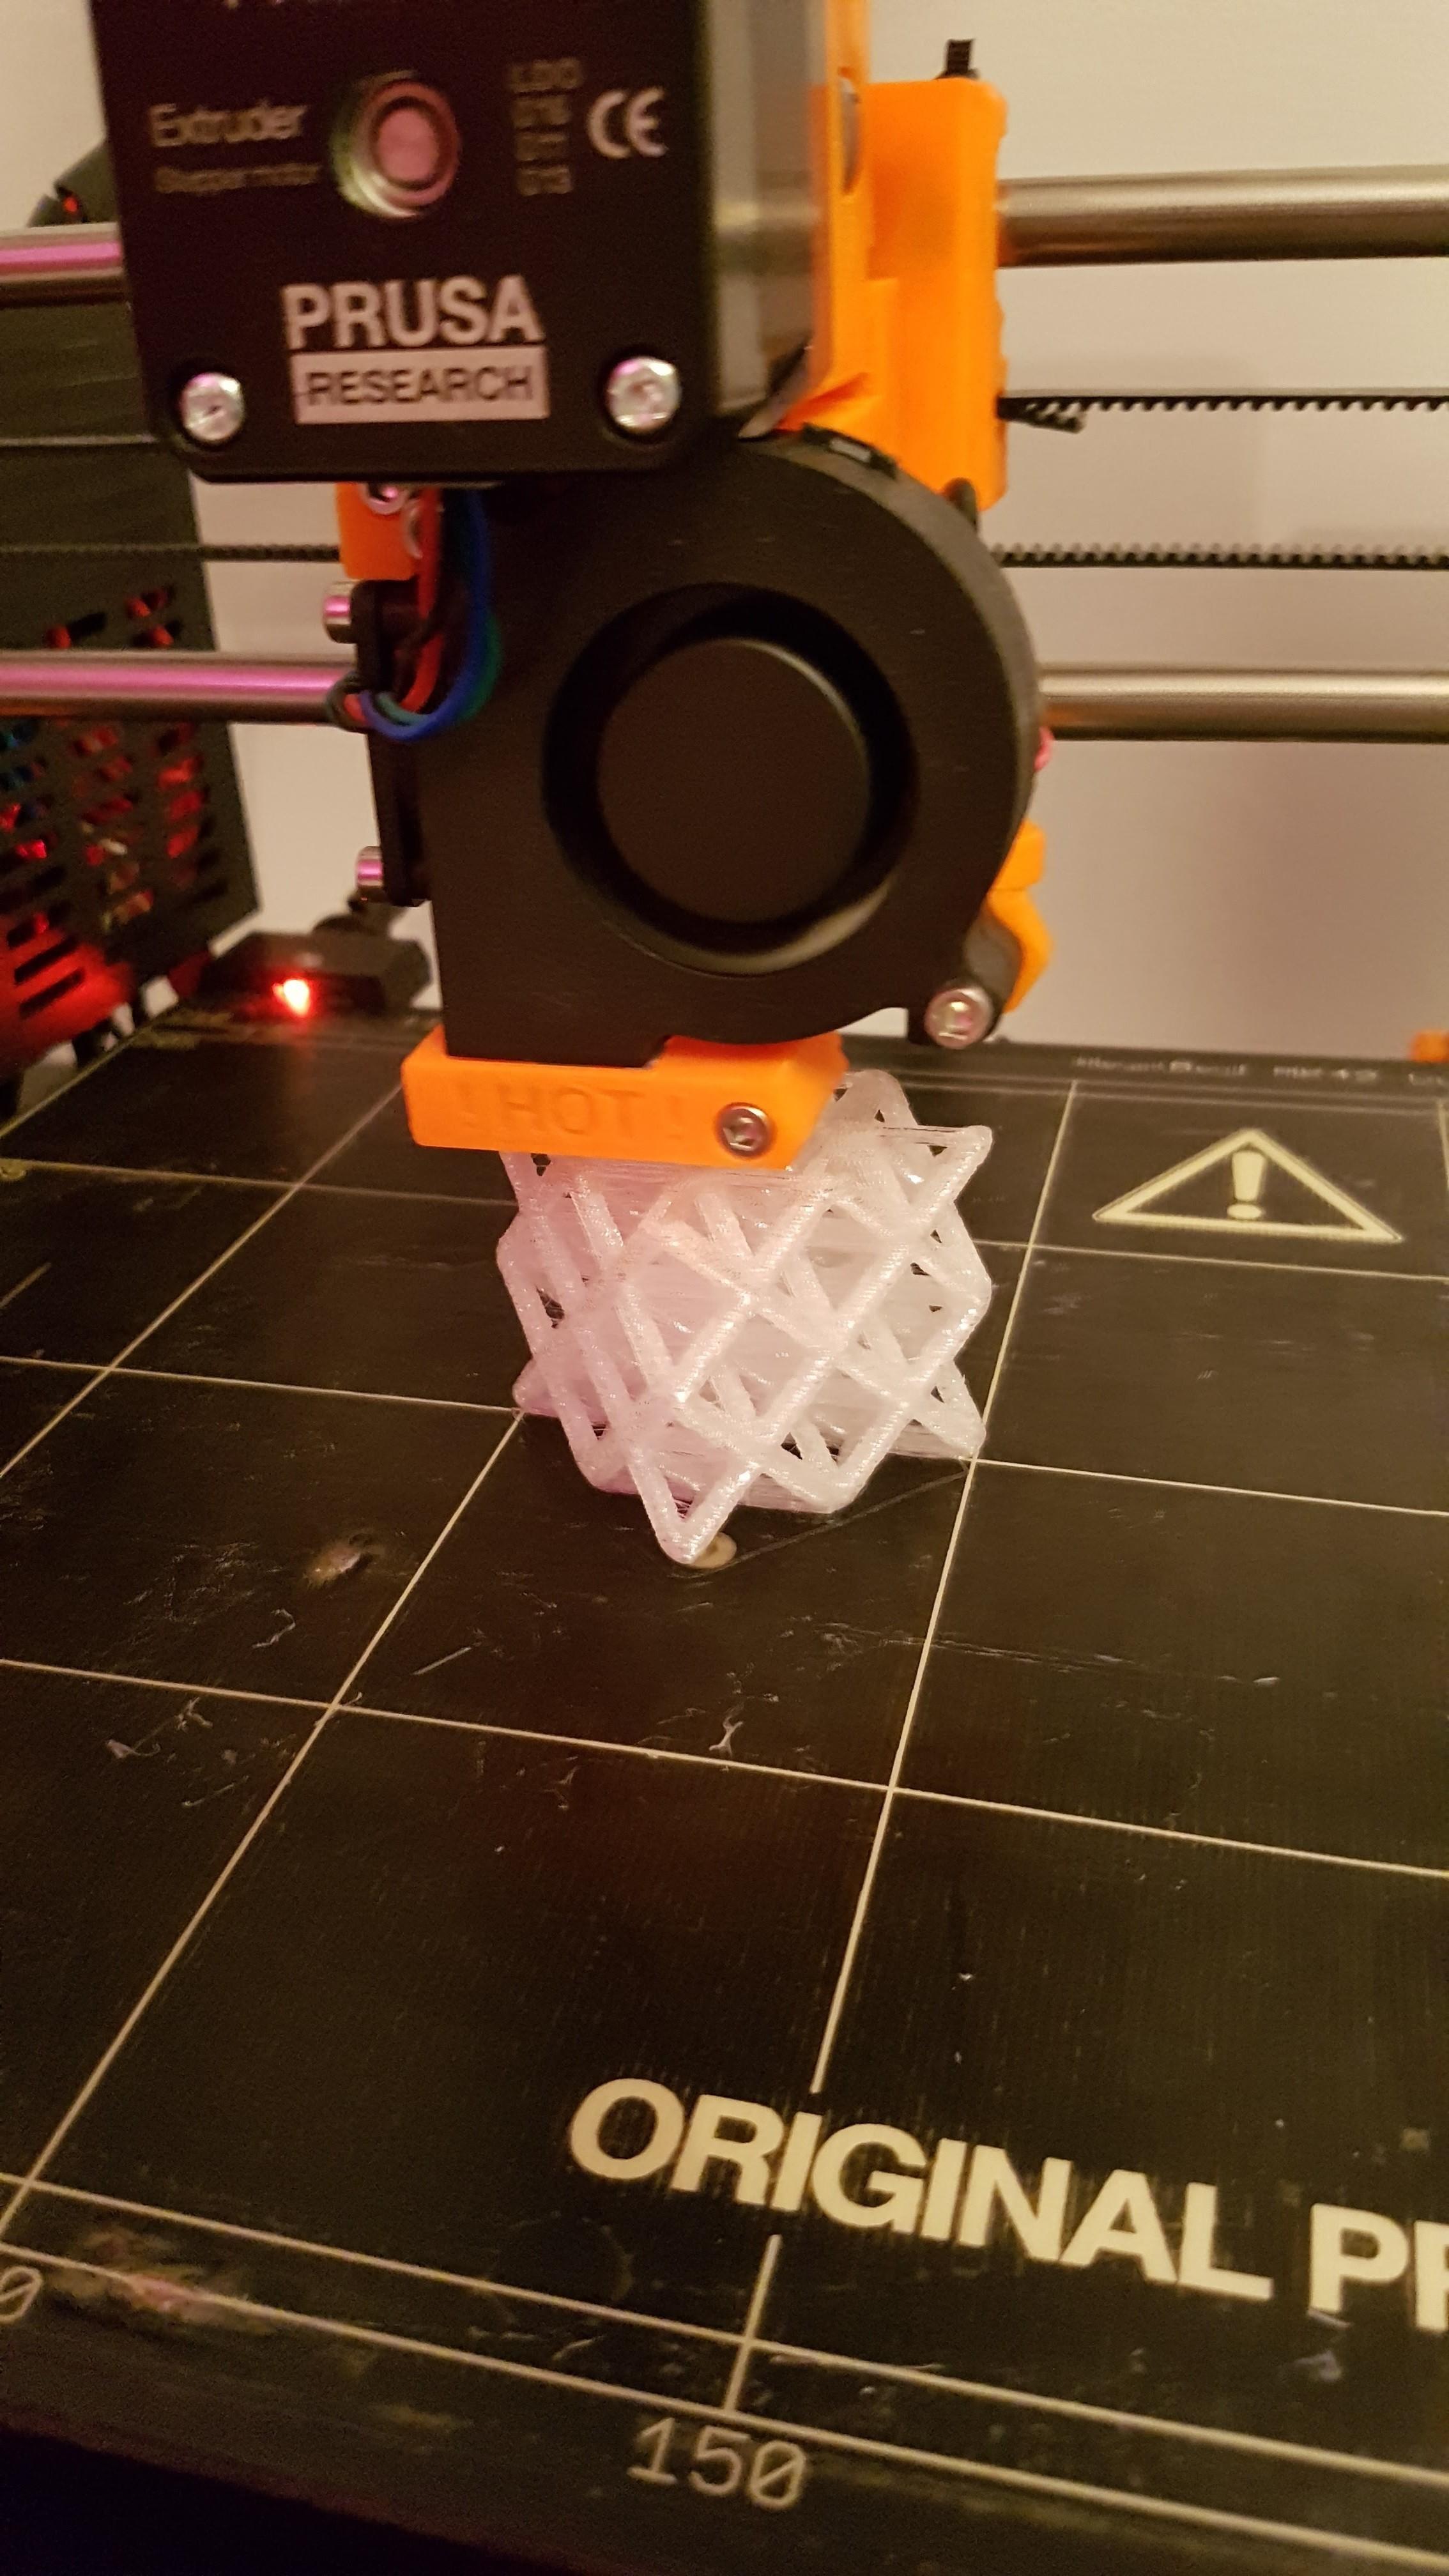 20170408_114952.jpg Download STL file 64 Tetrahedron Grid • 3D printing template, VertexMachine